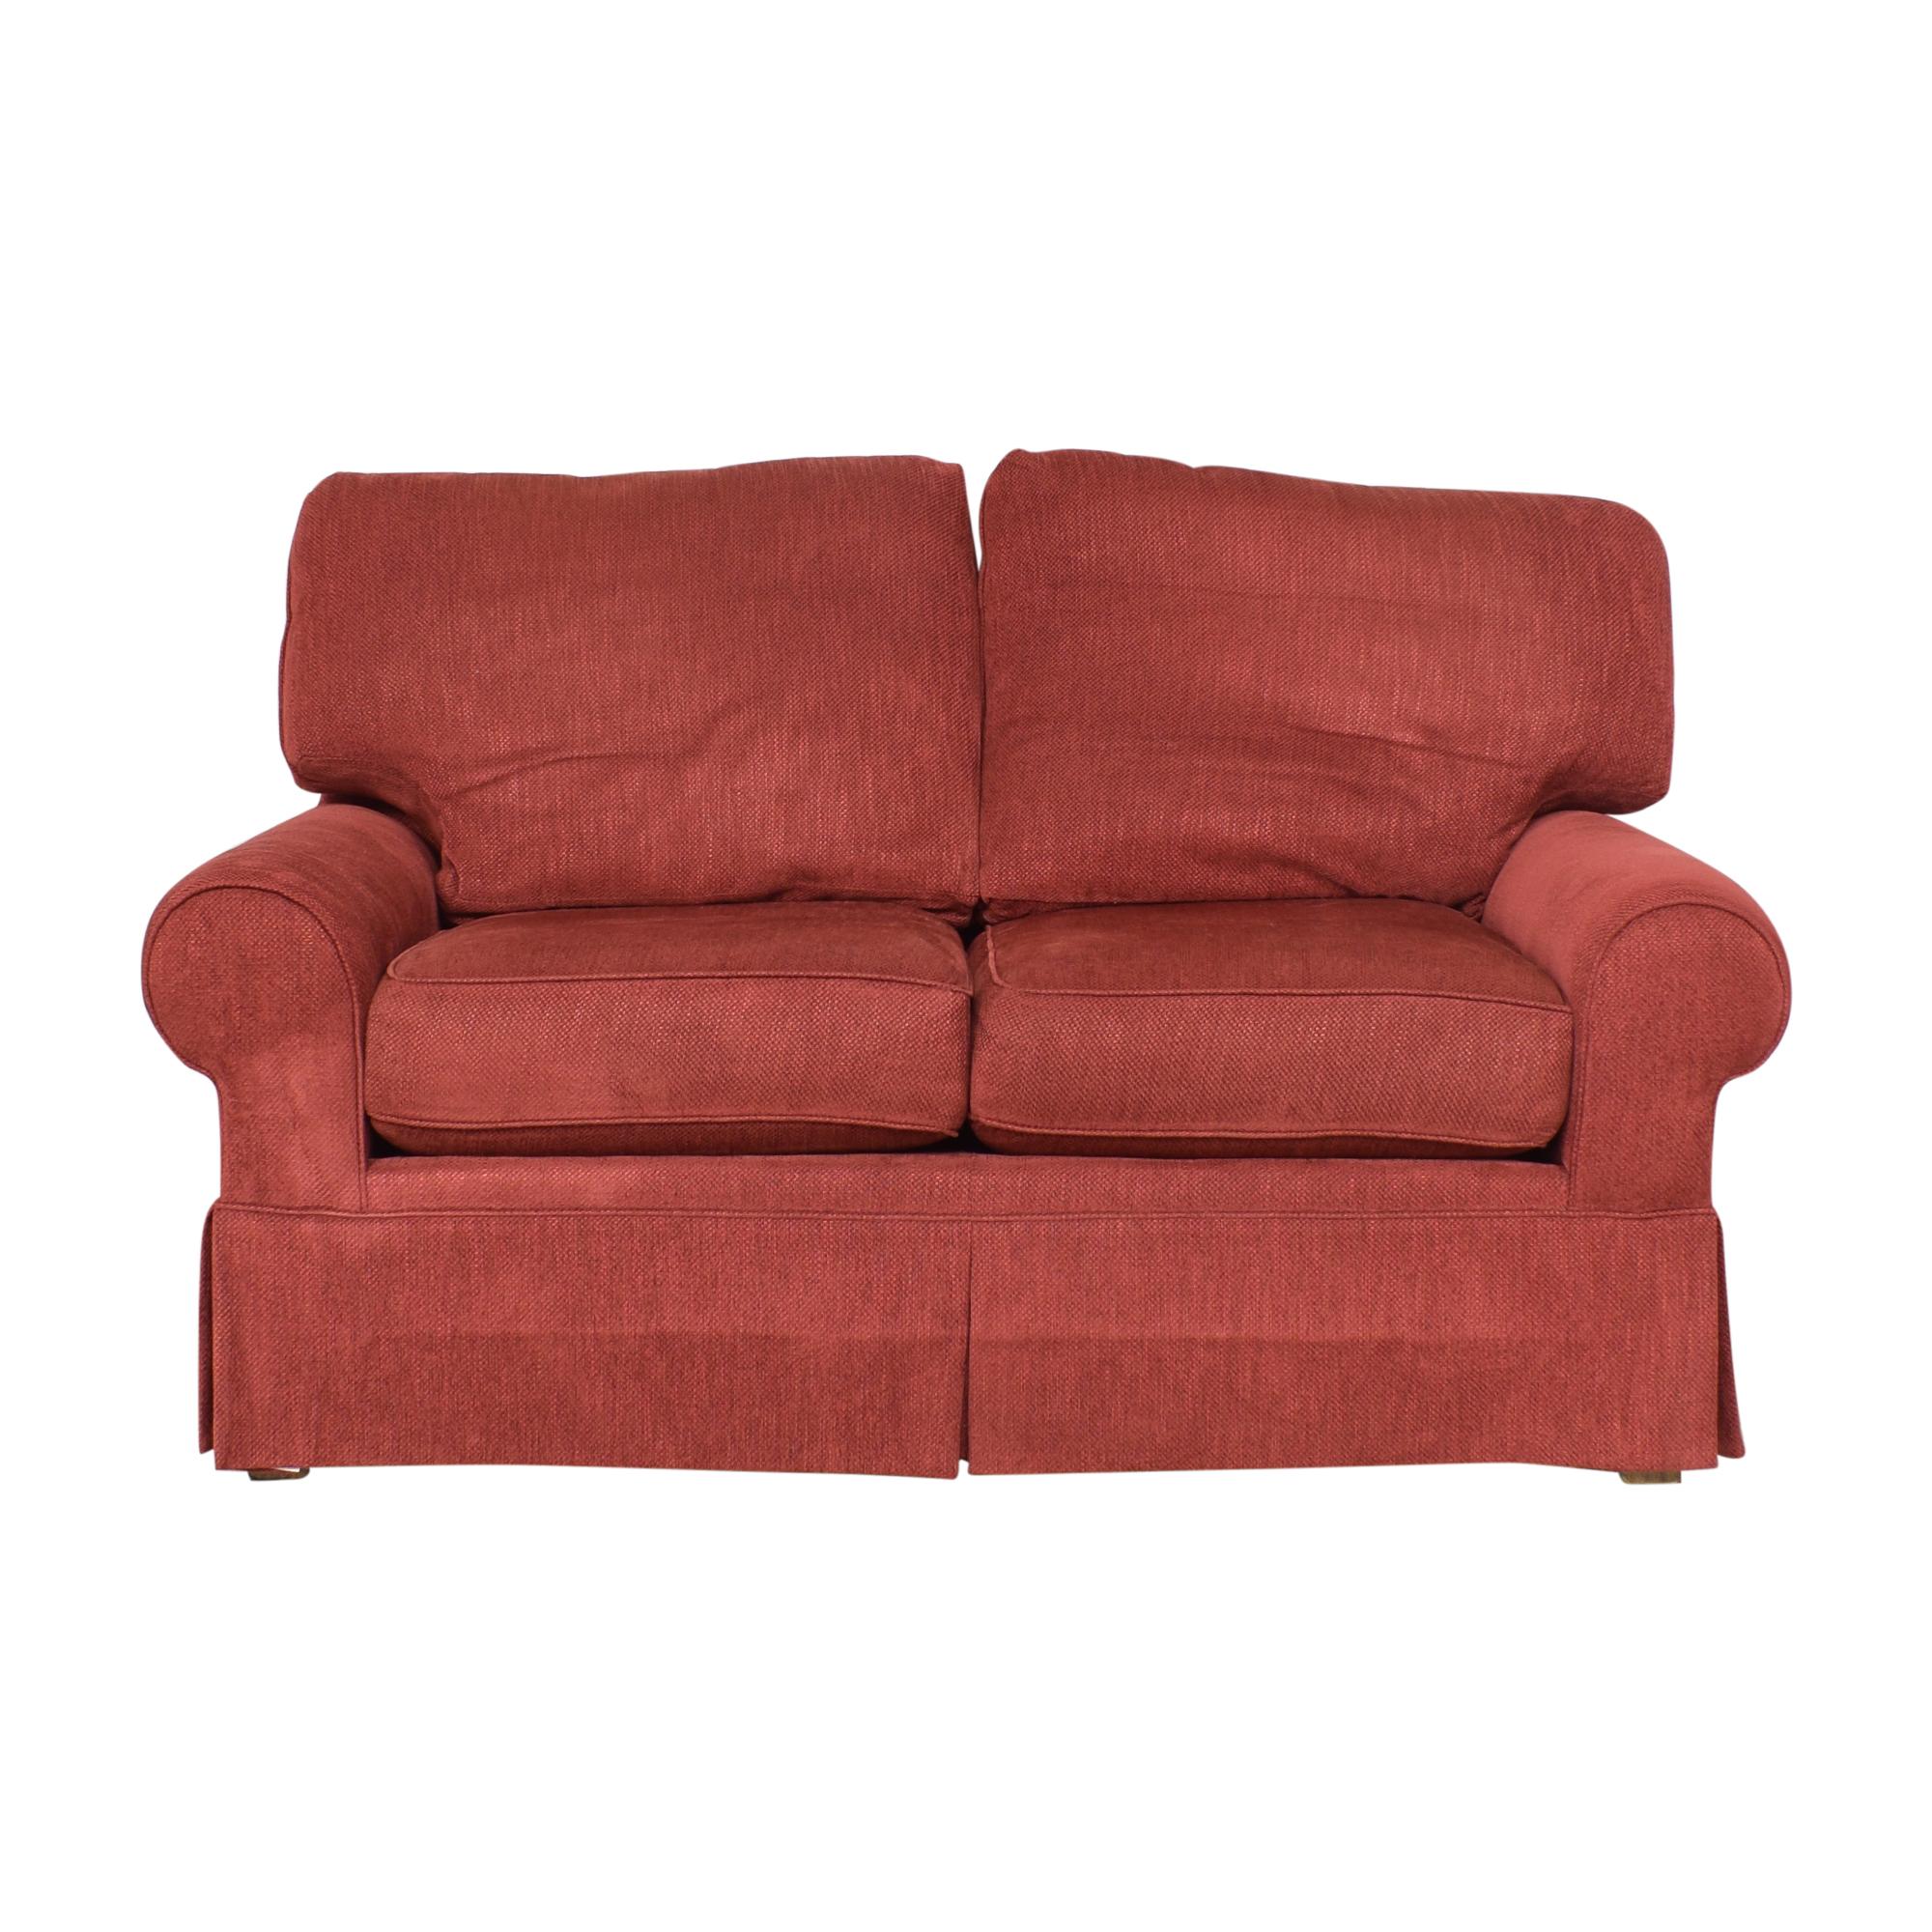 Masterfield Furniture Masterfield Furniture Roll Arm Loveseat coupon